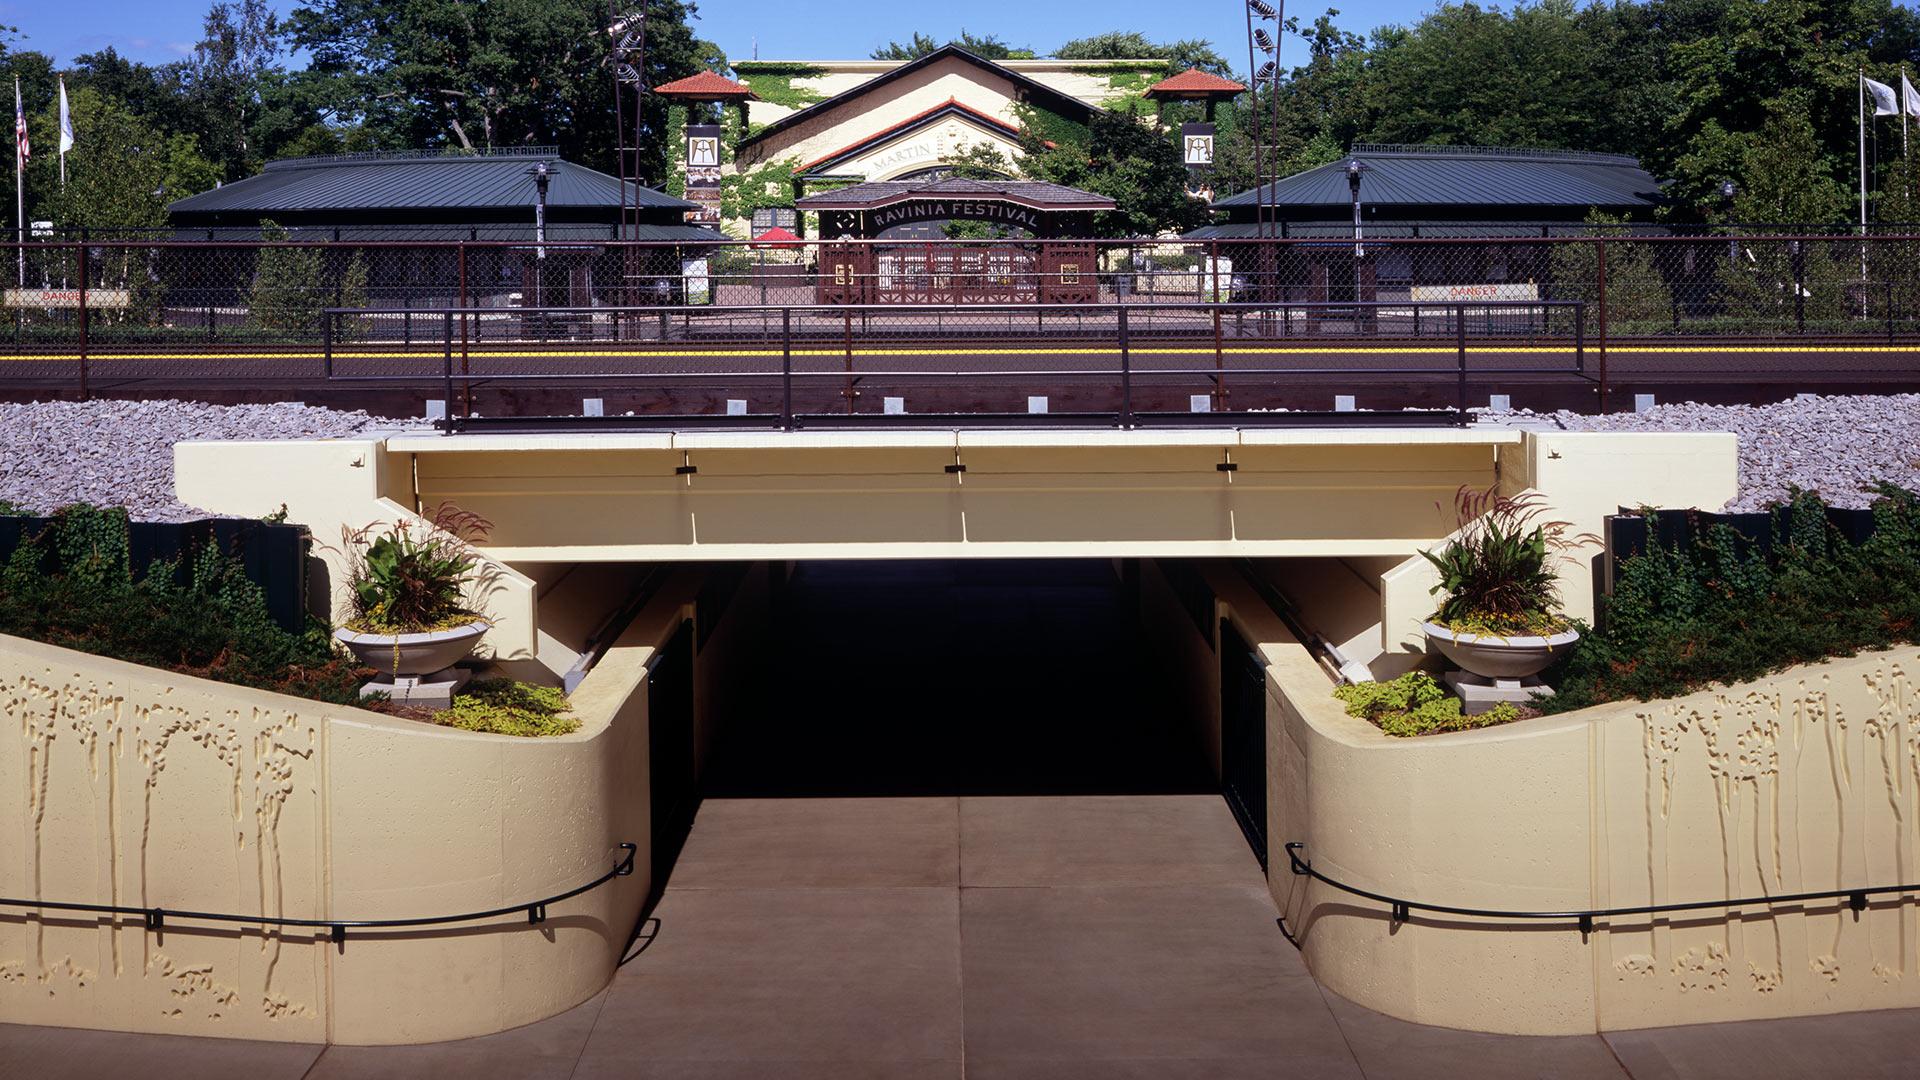 Ravinia Festival: Railroad Bridge and Pedestrian Underpass